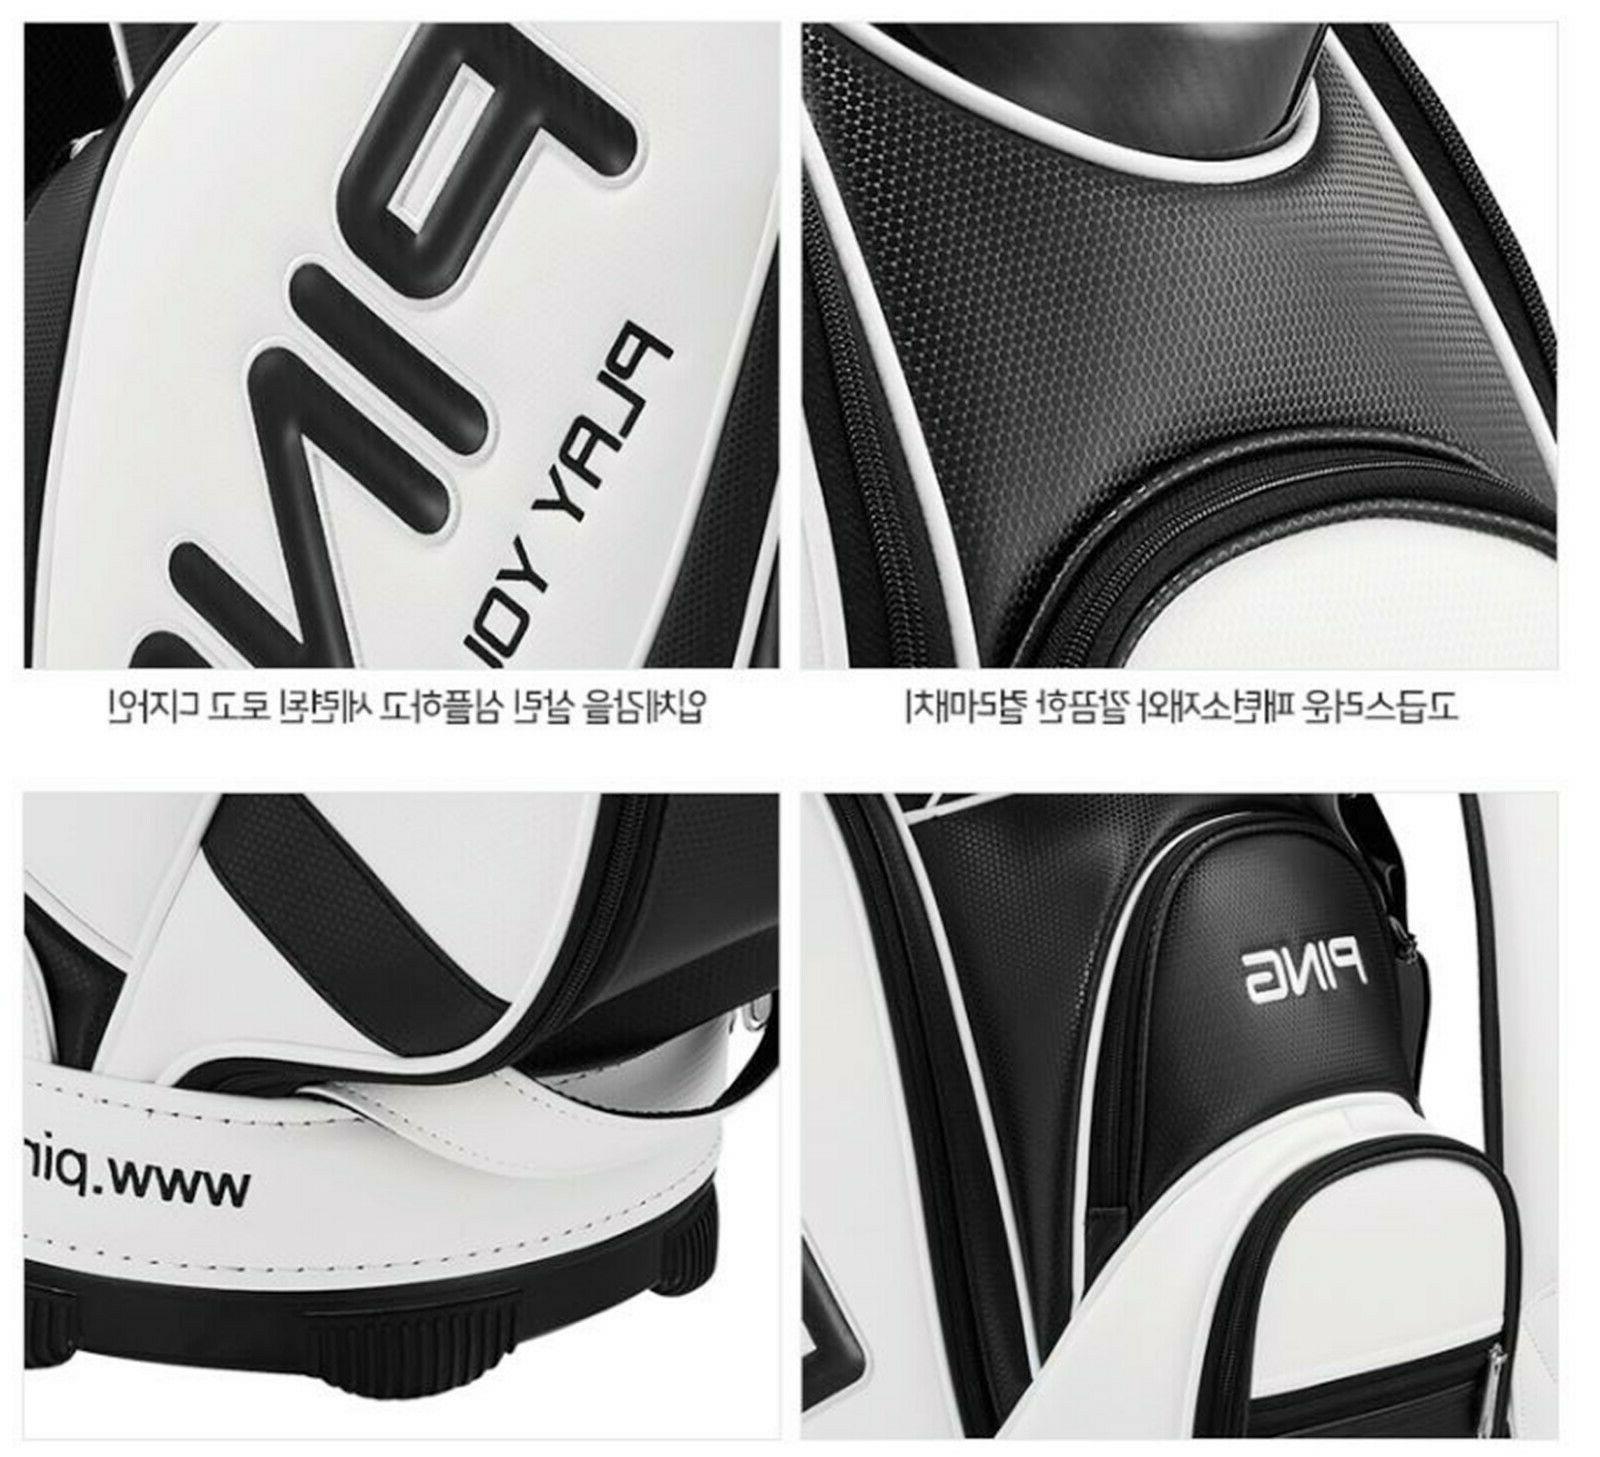 Ping Men's Caddie Bag-9In, 9.5lb PVC,Navy/EMS